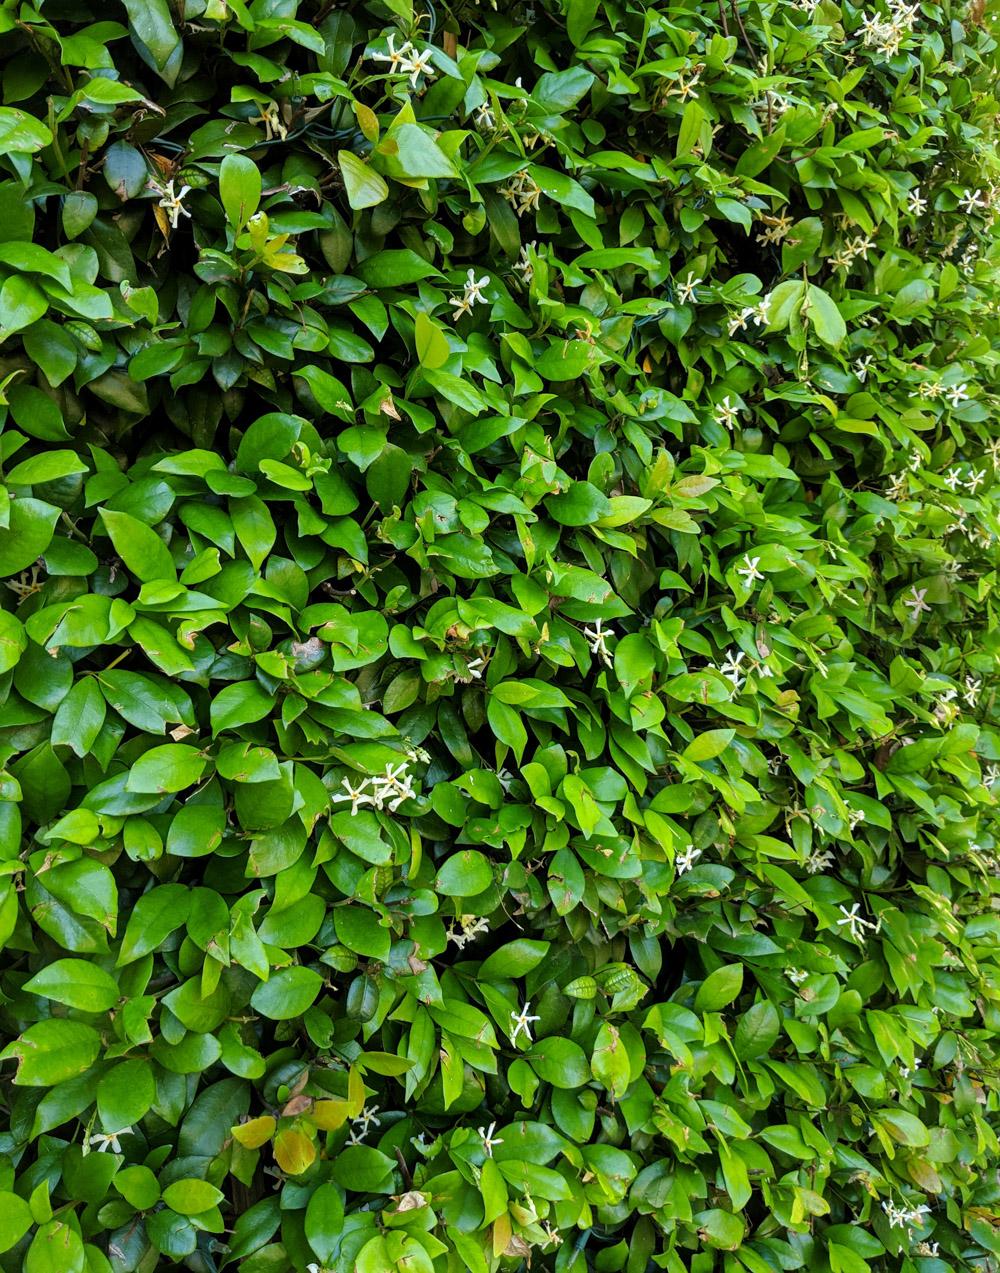 Jasmine-creates-an-abundant-green-backdrop